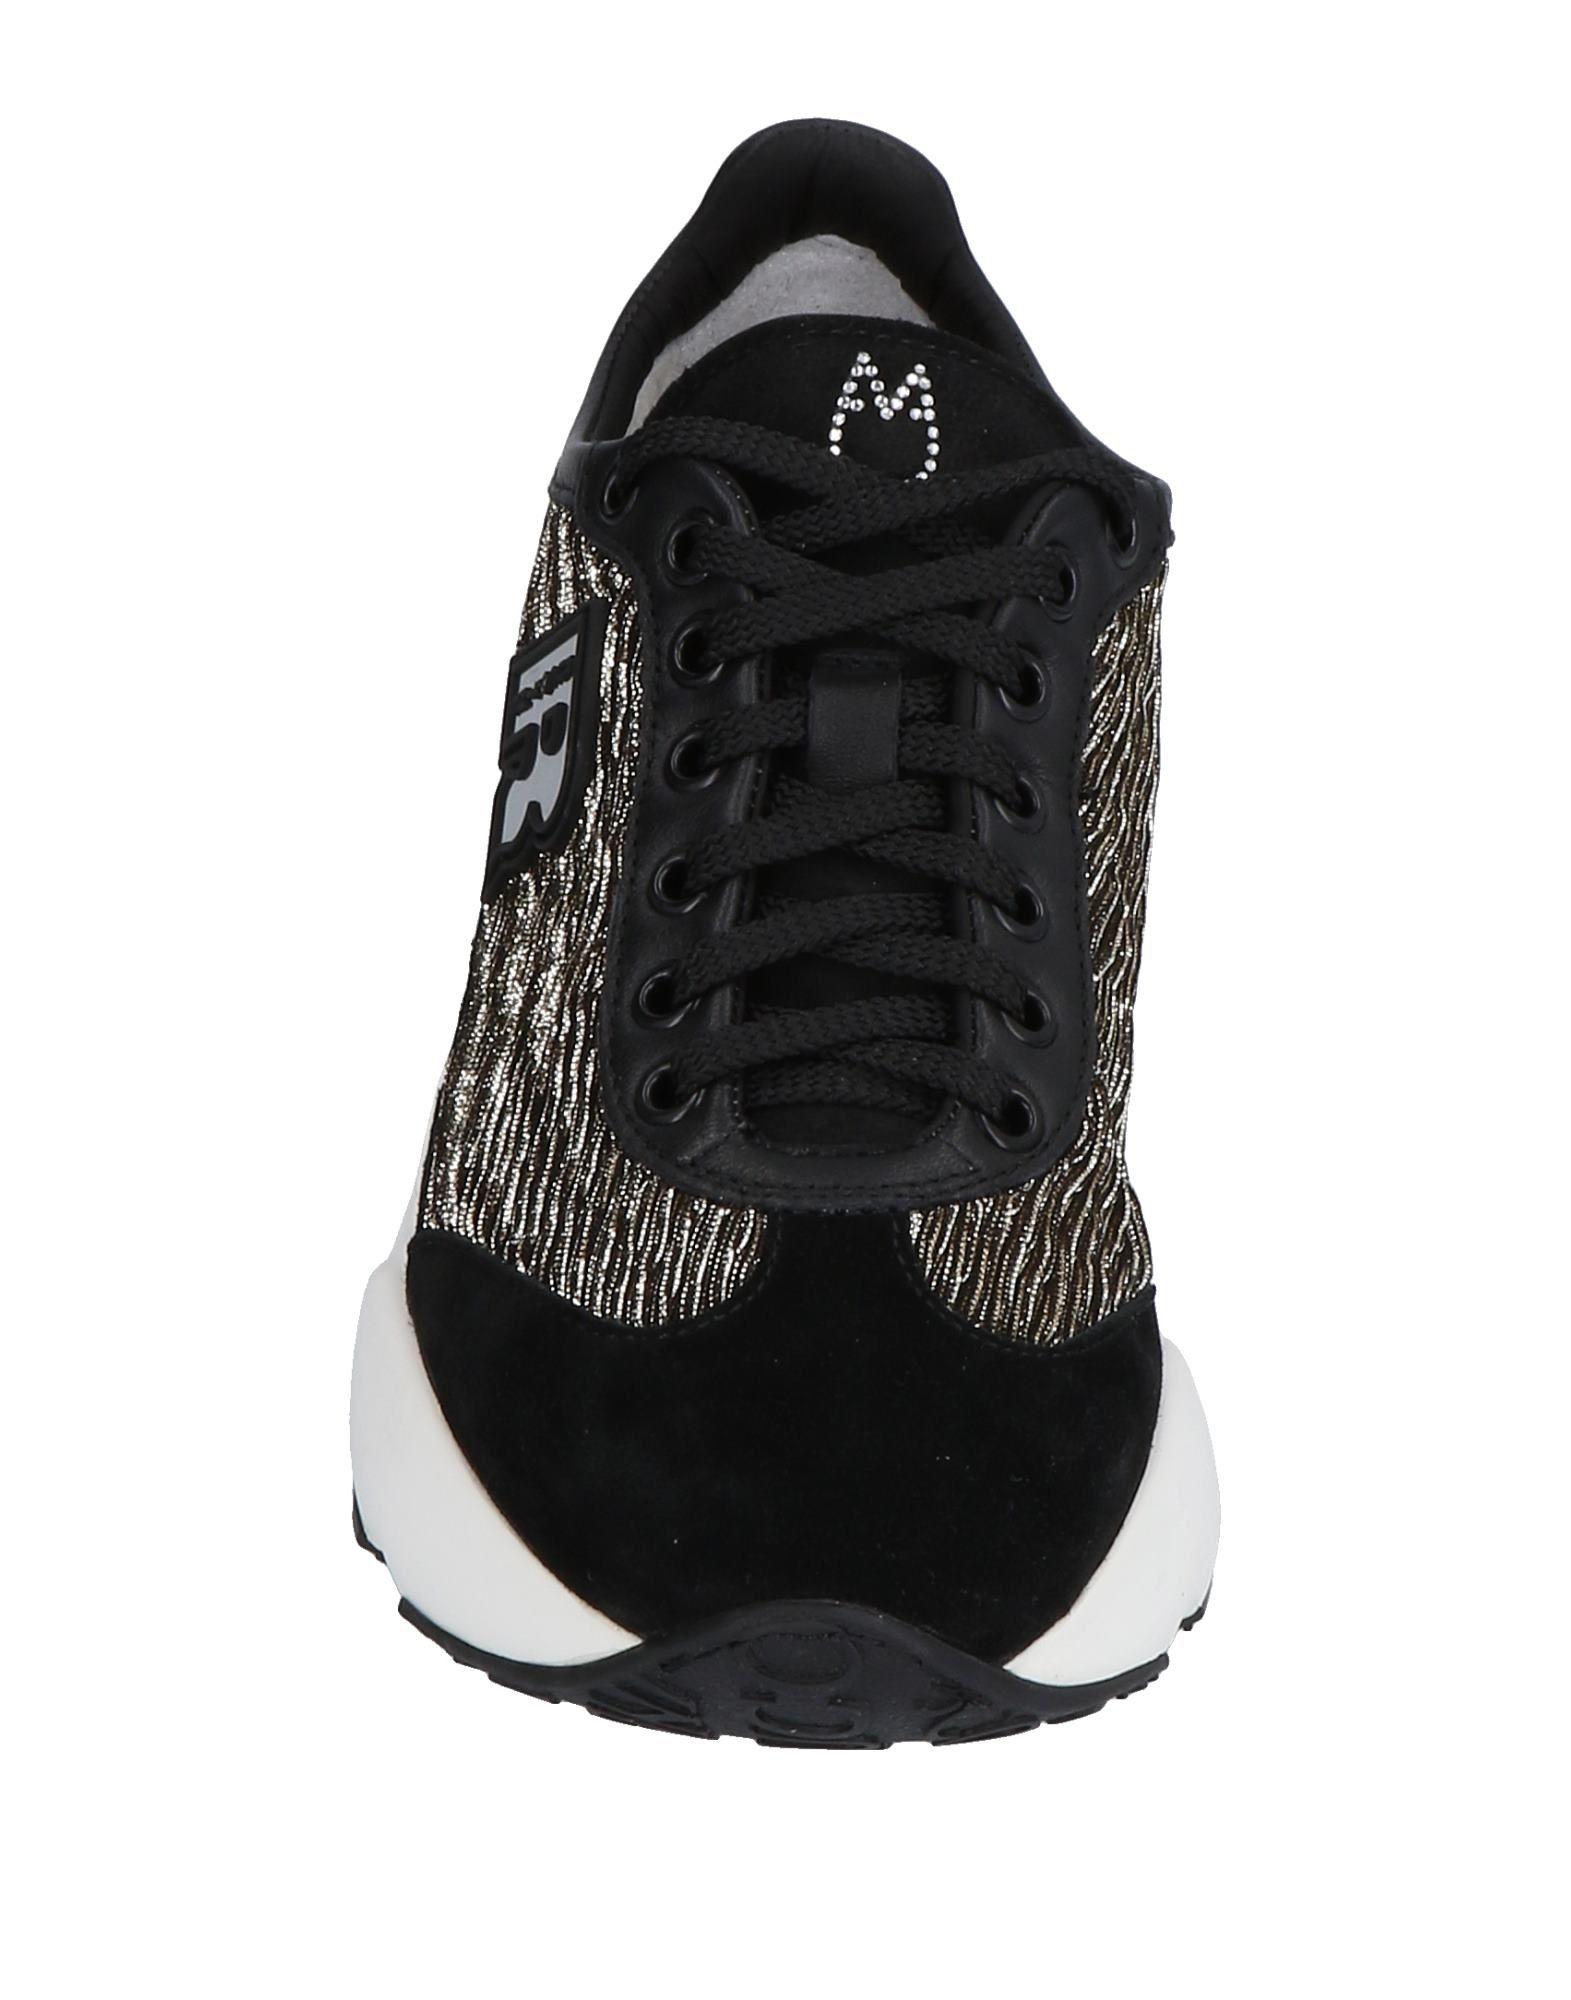 Stilvolle billige Sneakers Schuhe Ruco Line Sneakers billige Damen  11496109GL 5c9807